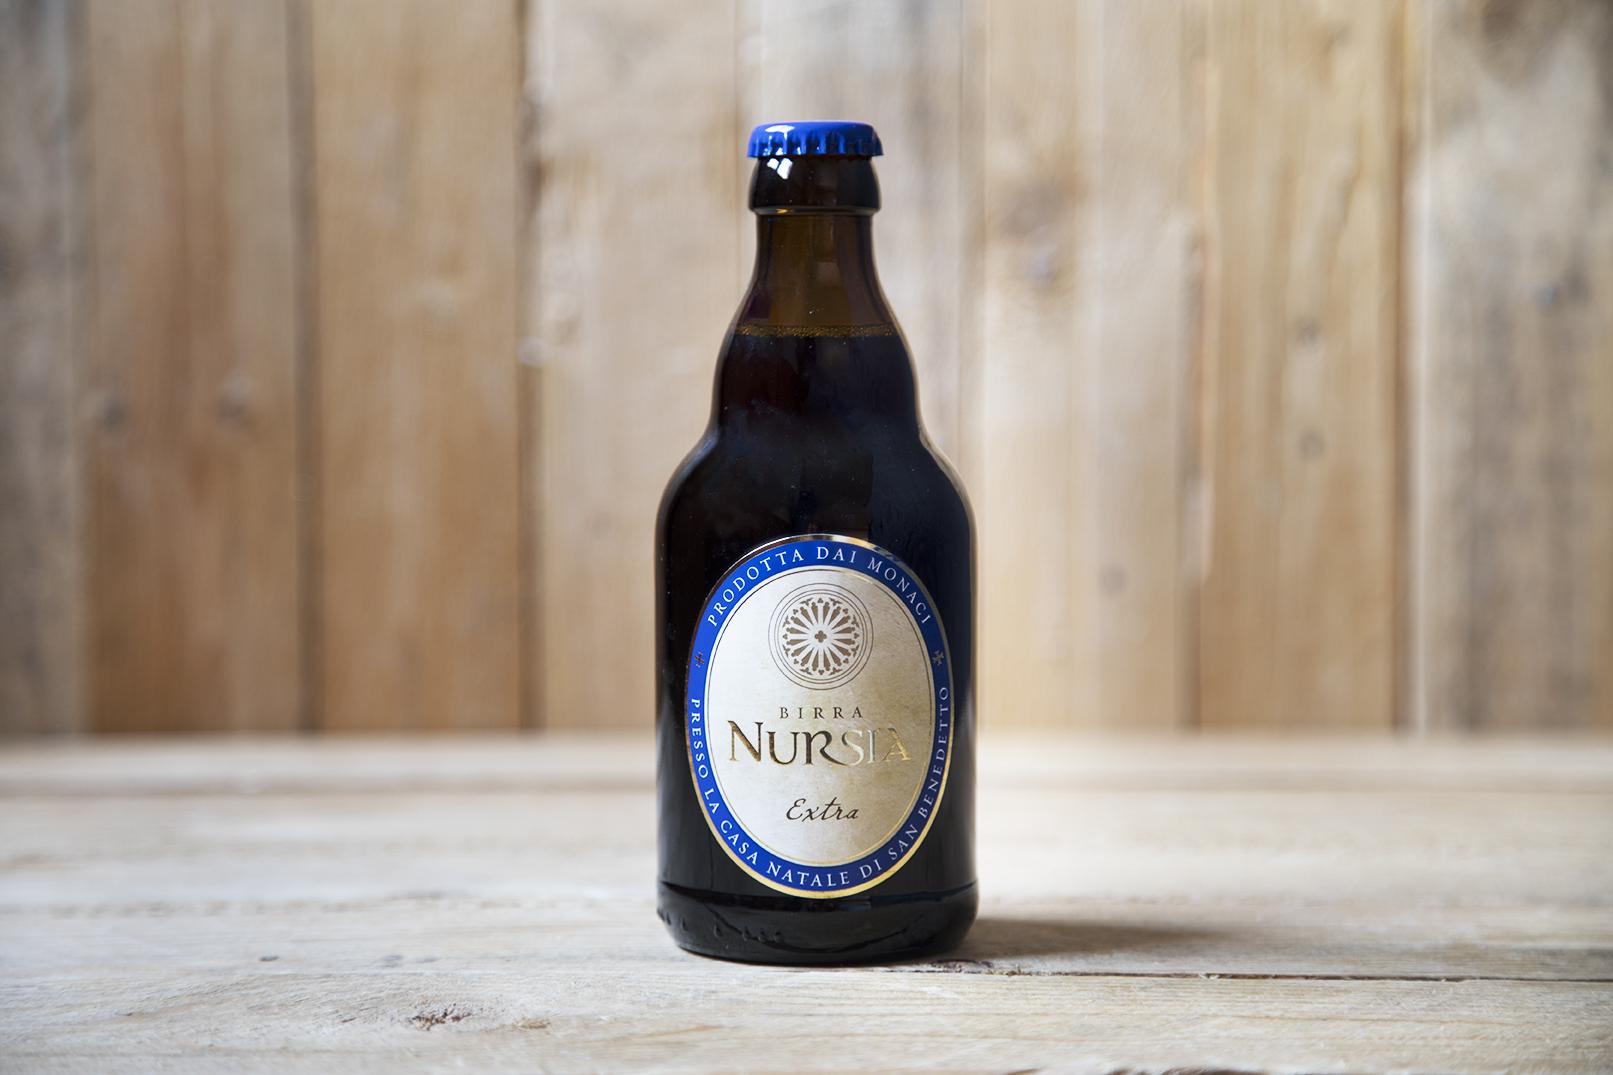 Birra Nursia extra